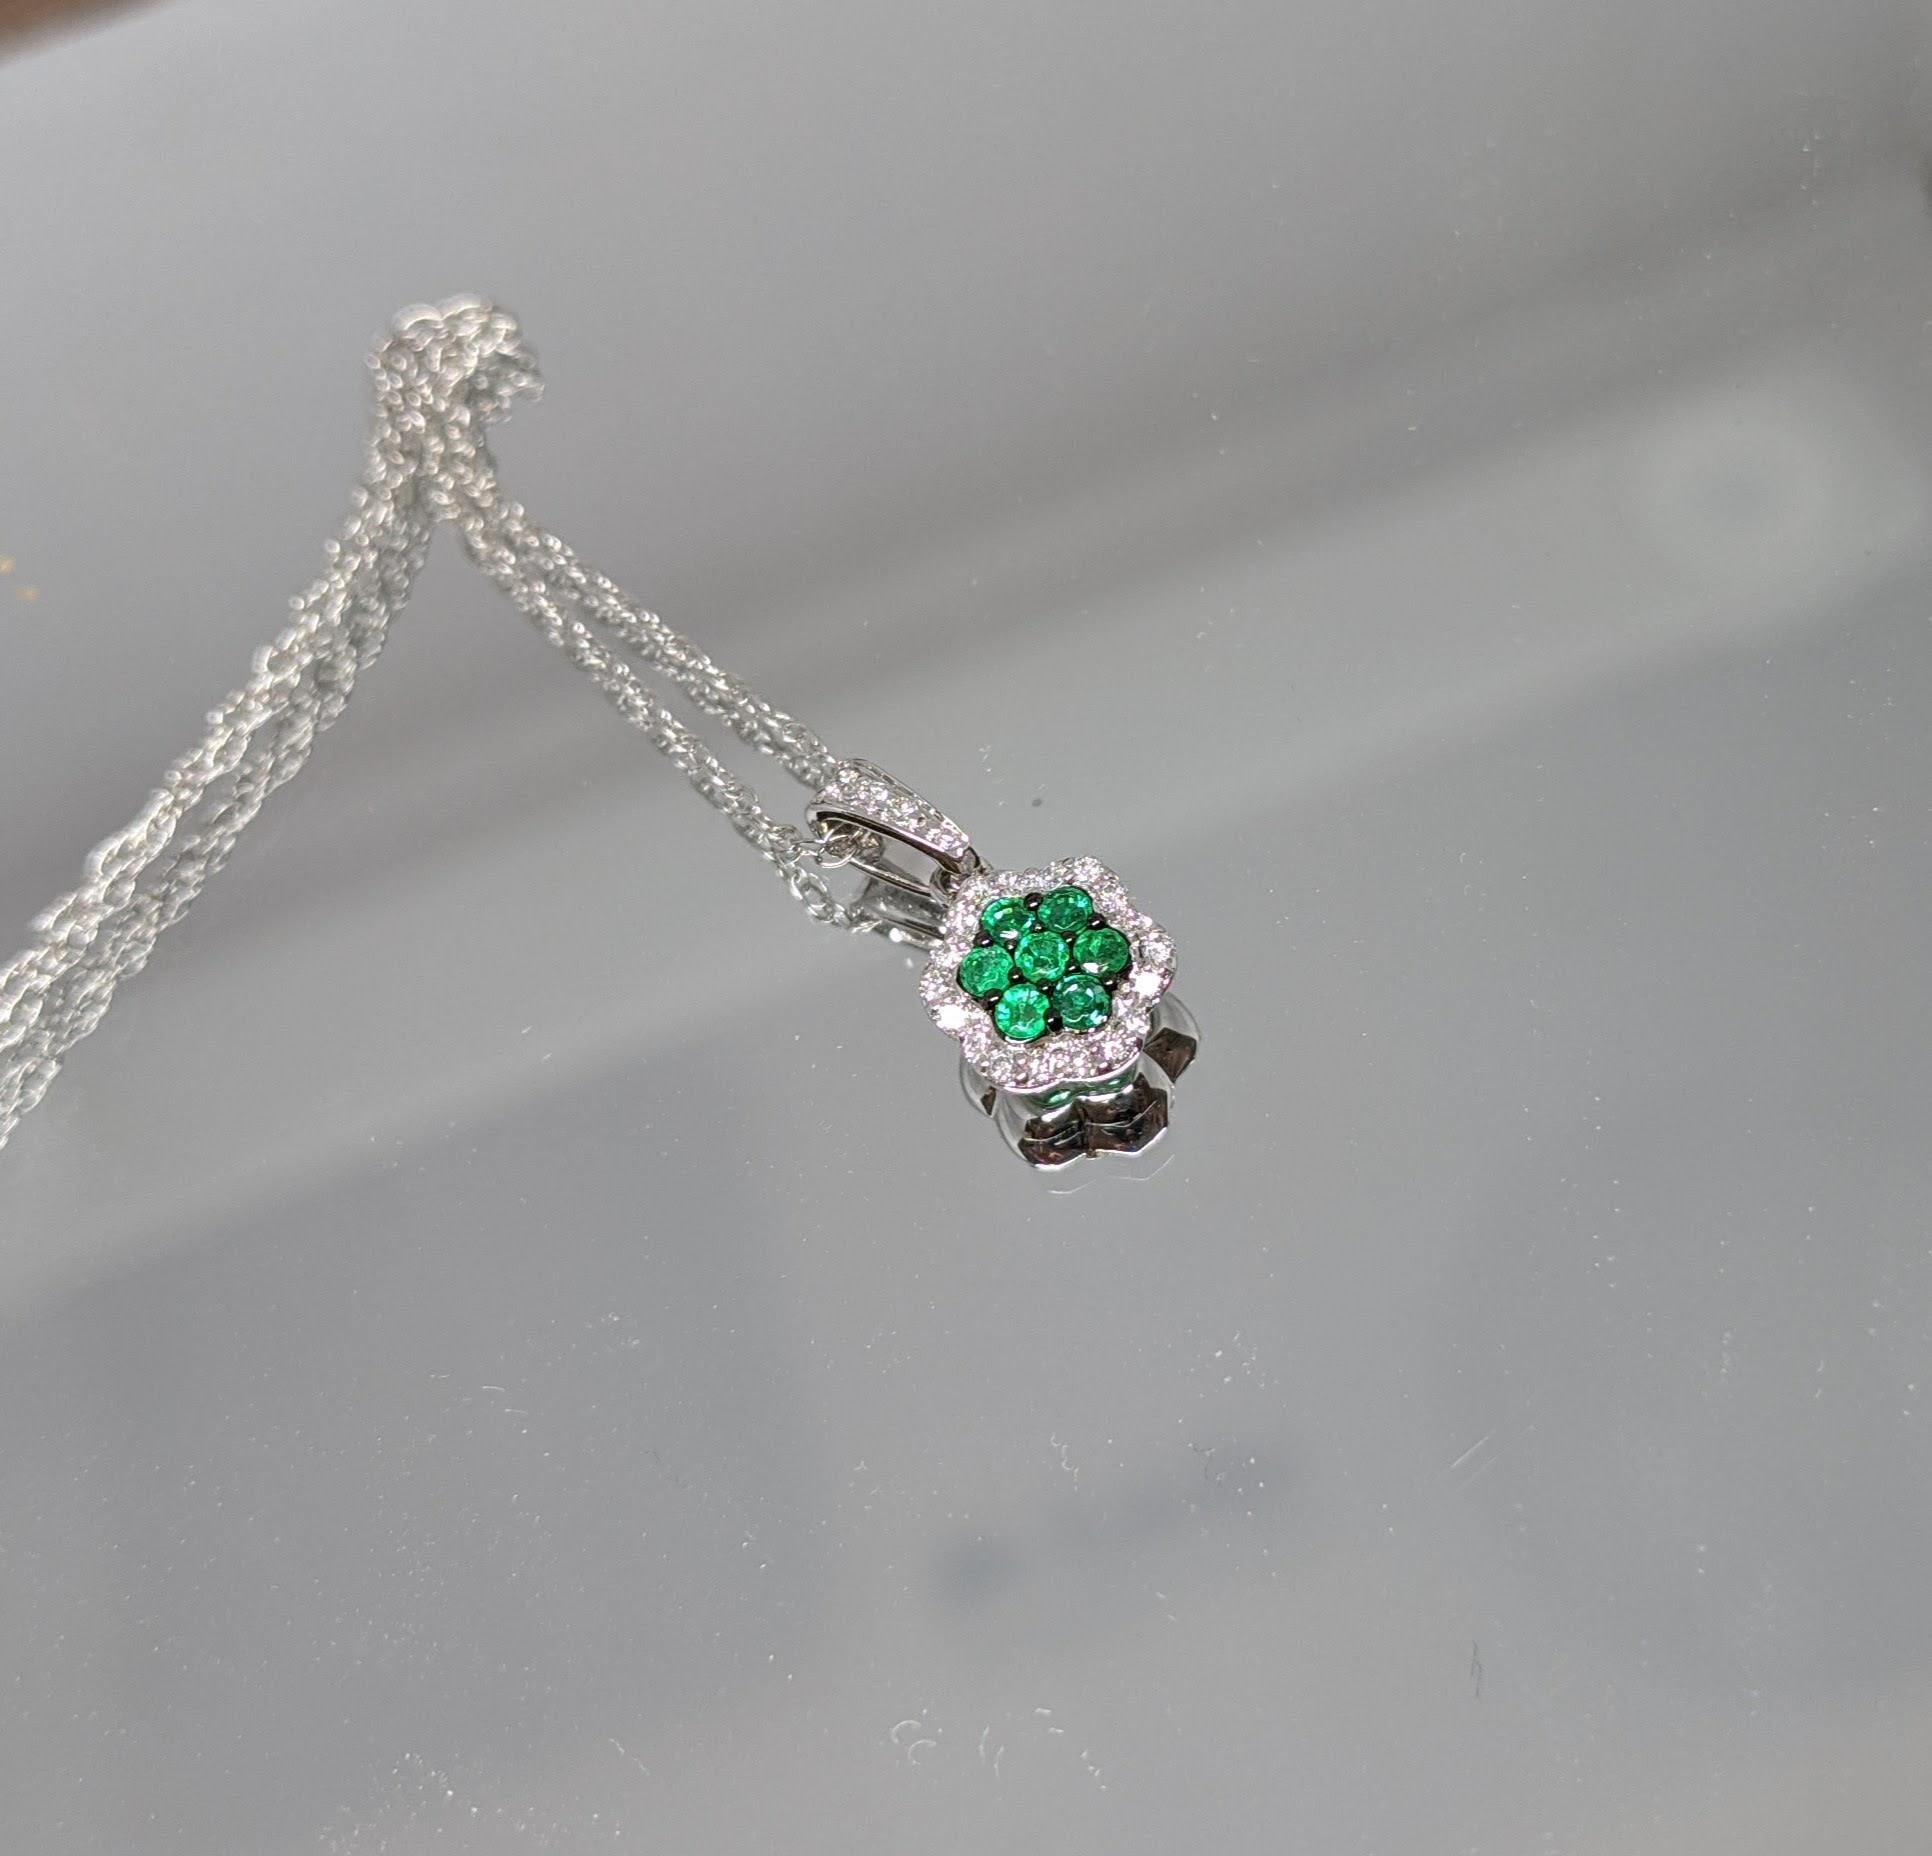 14K White Gold Emerald and Diamond Halo Pendant Necklace